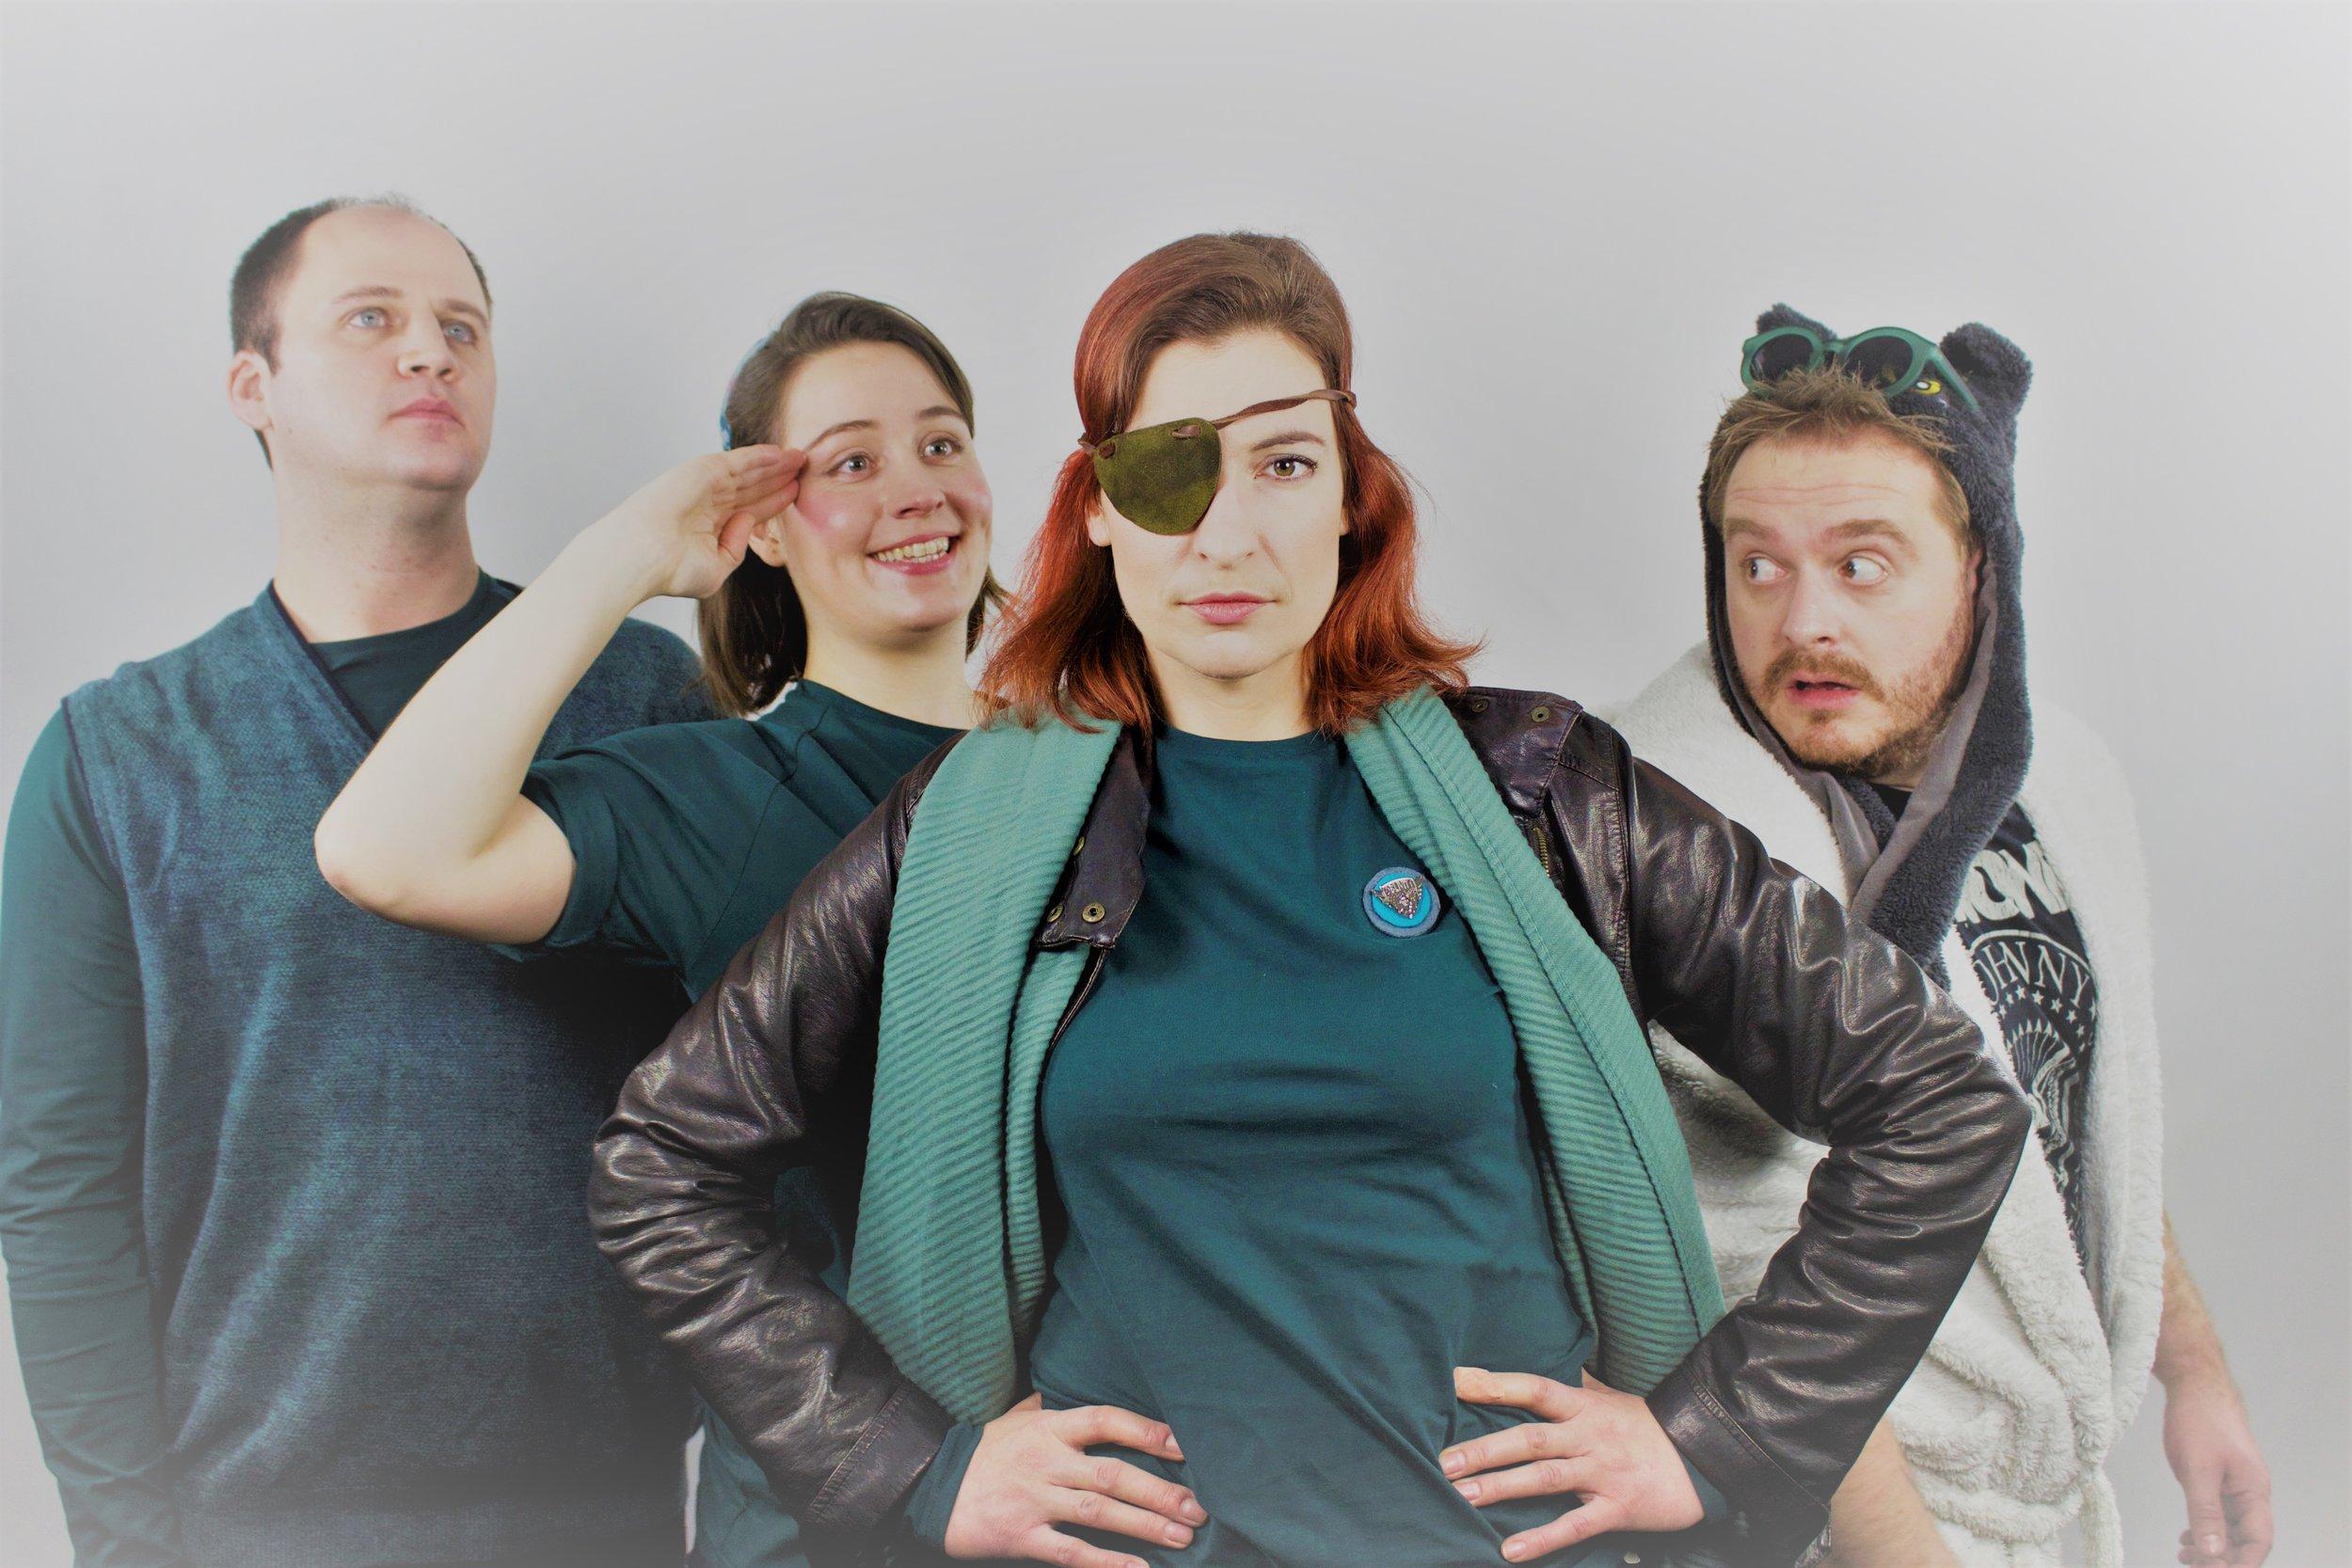 Download cast imageL-R: Max Windich (Burney); Hannah Wilmshurst (Christy); Cate Nunn (Falconer); Ashley Hunt (Lowell) -